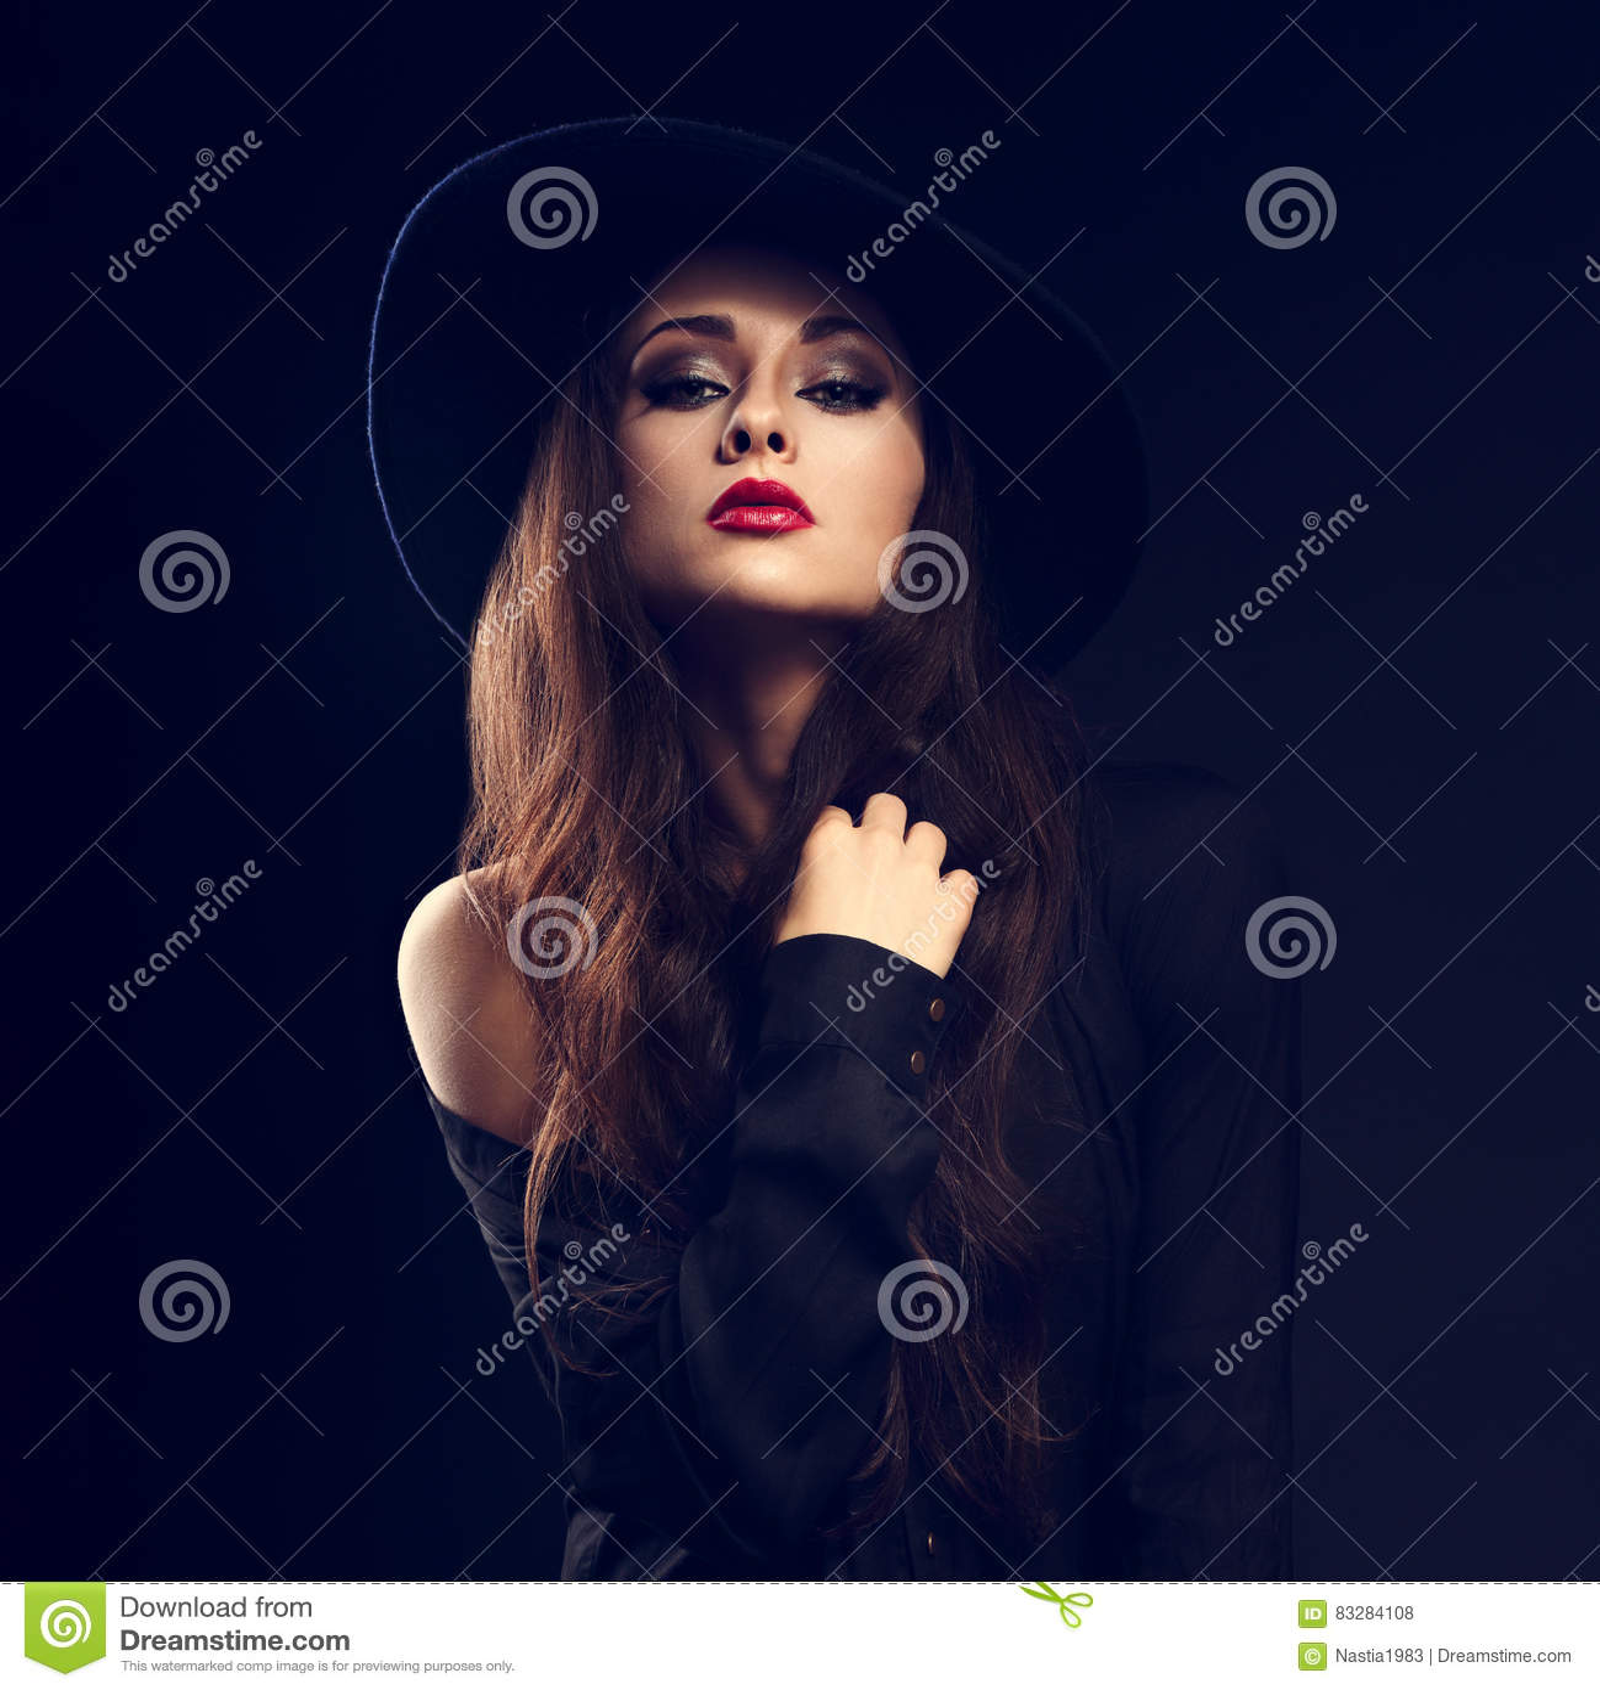 glamour female model posing in black shirt and elegant hat